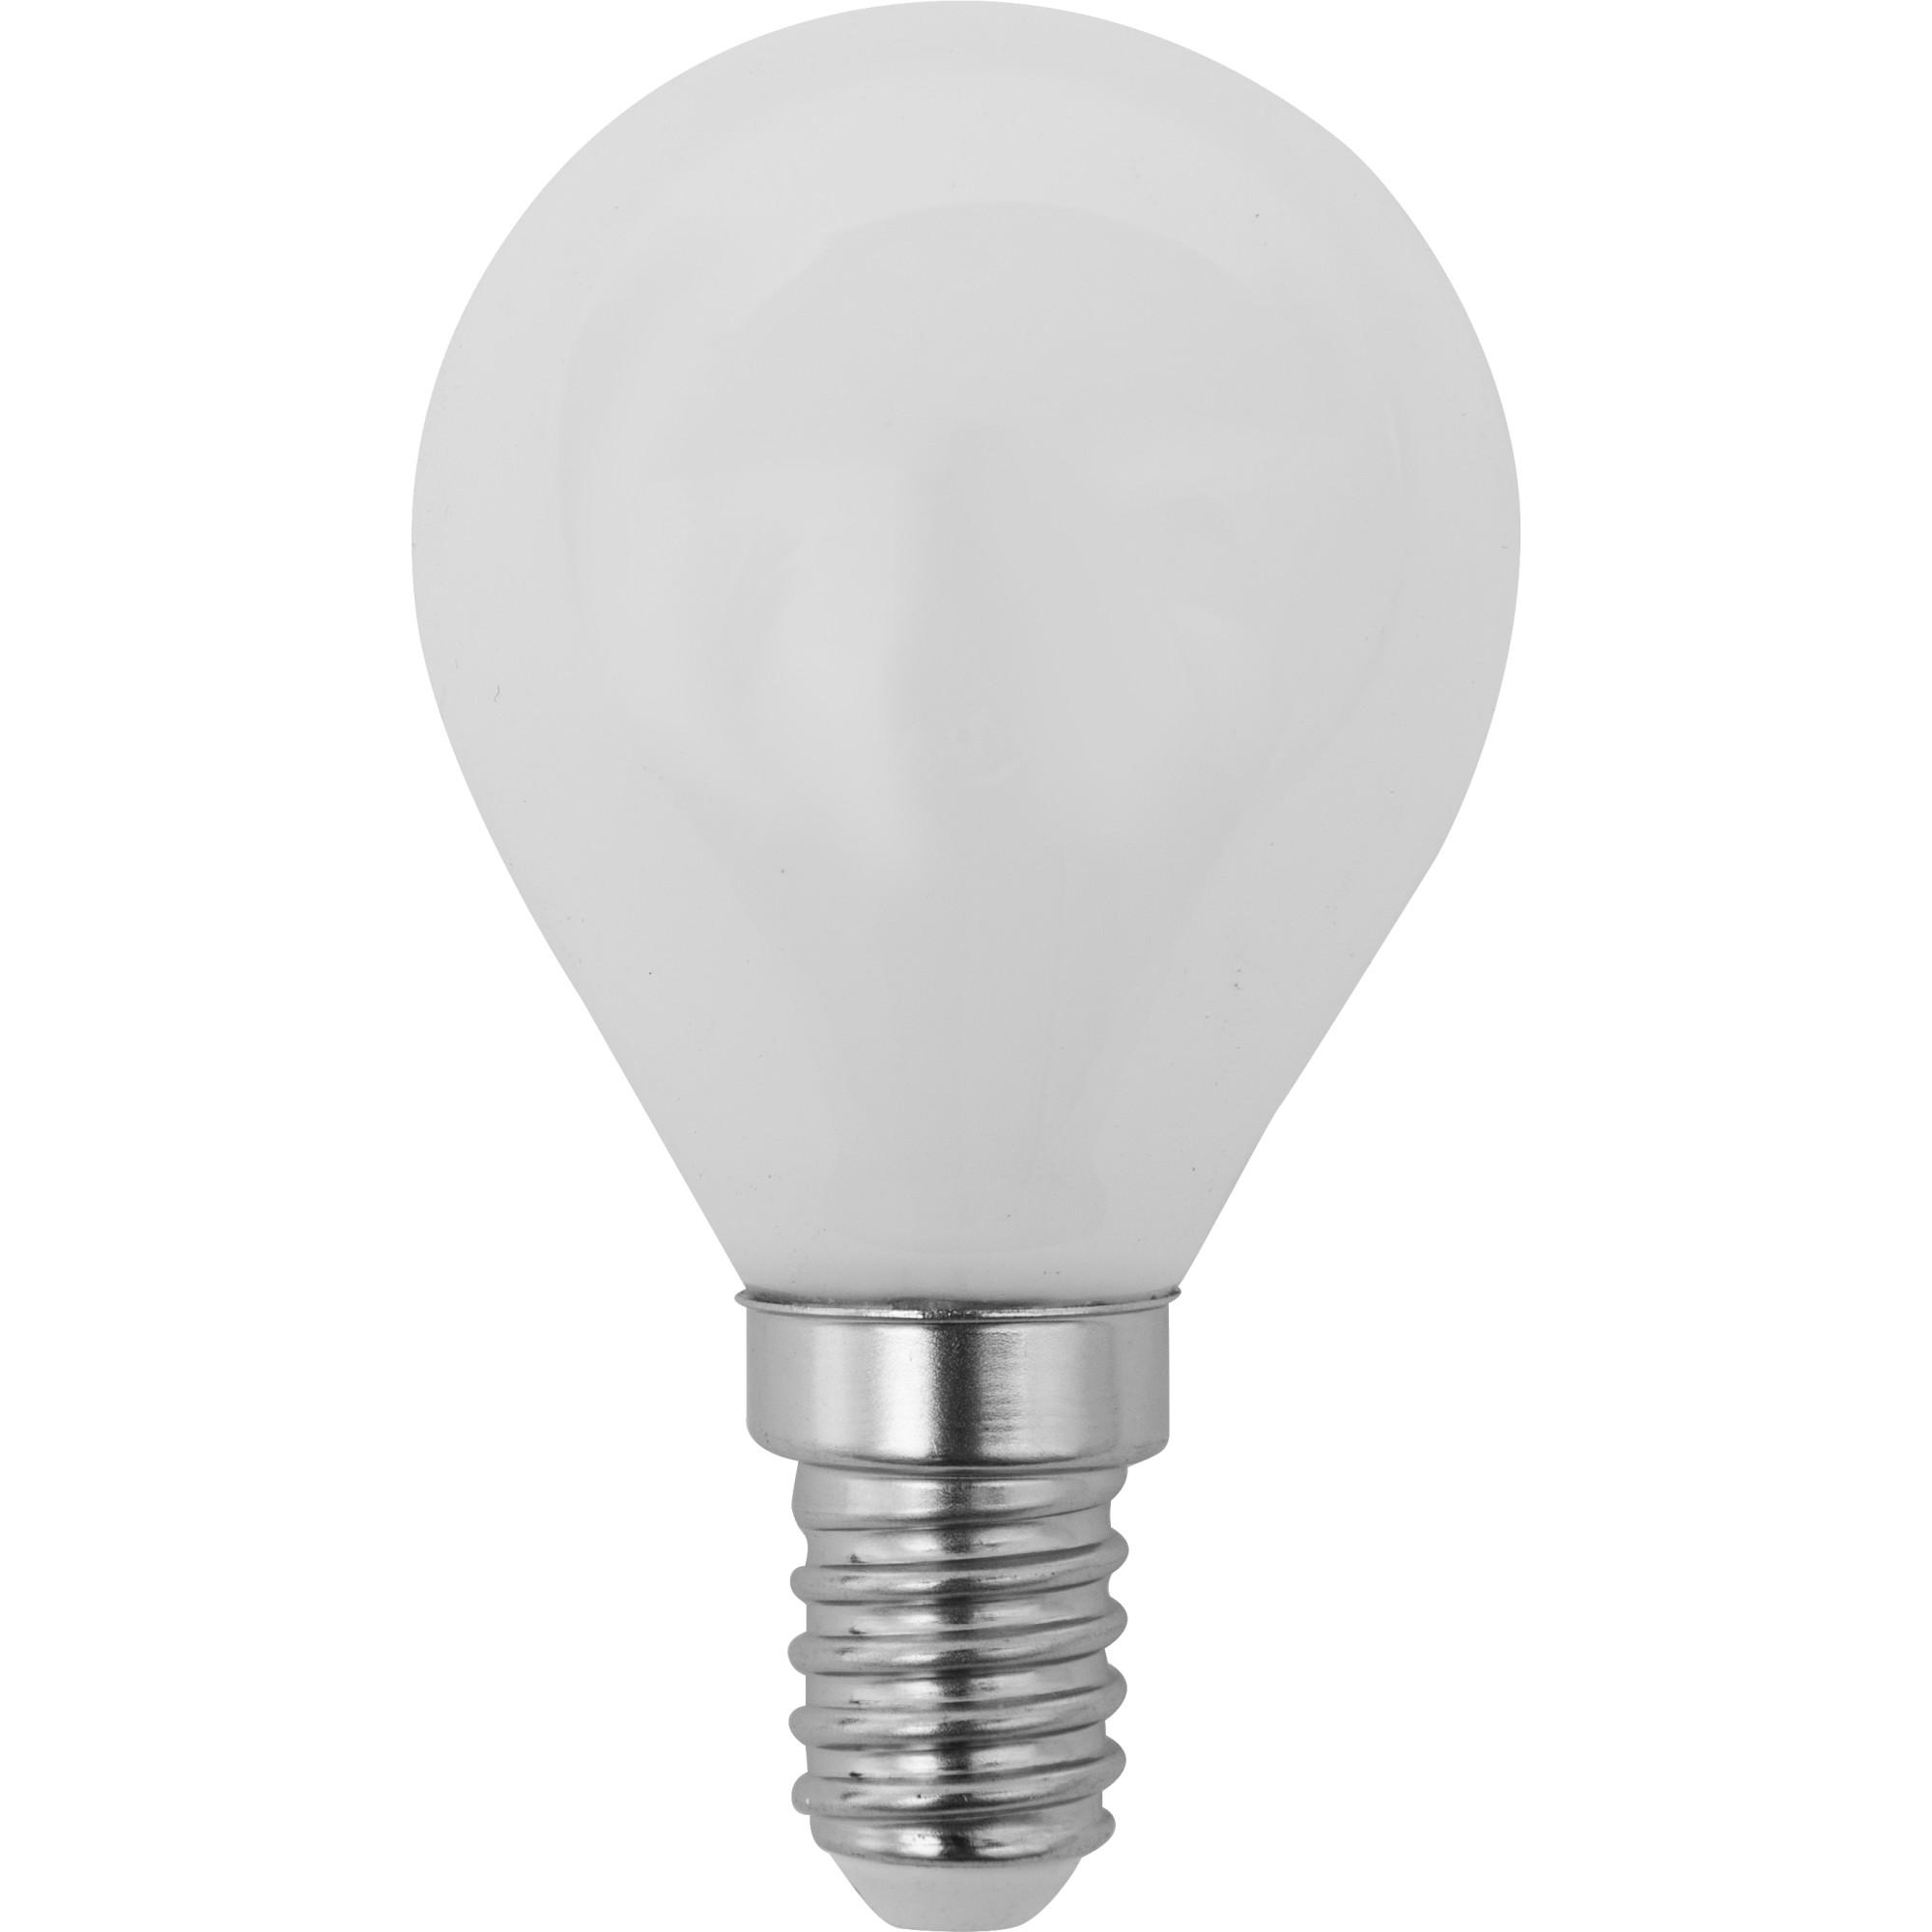 Лампа светодиодная Lexman E14 45 Вт 470 Лм 2700 K свет тёплый белый матовая колба